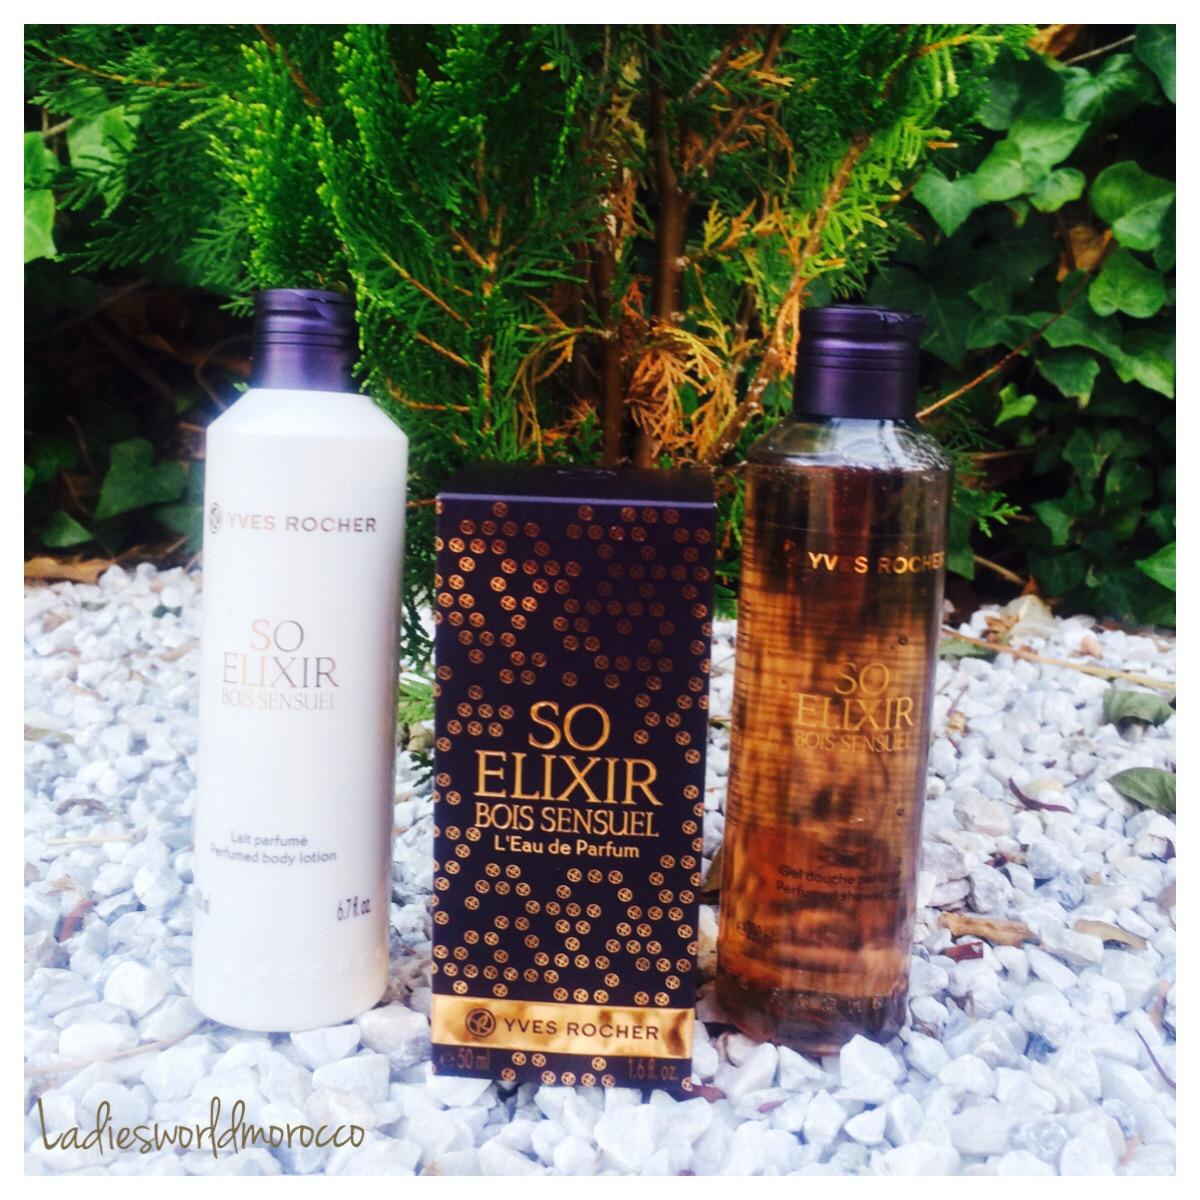 Le Nouveau So Elixir Bois Sensuel De Chez Yves Rocher